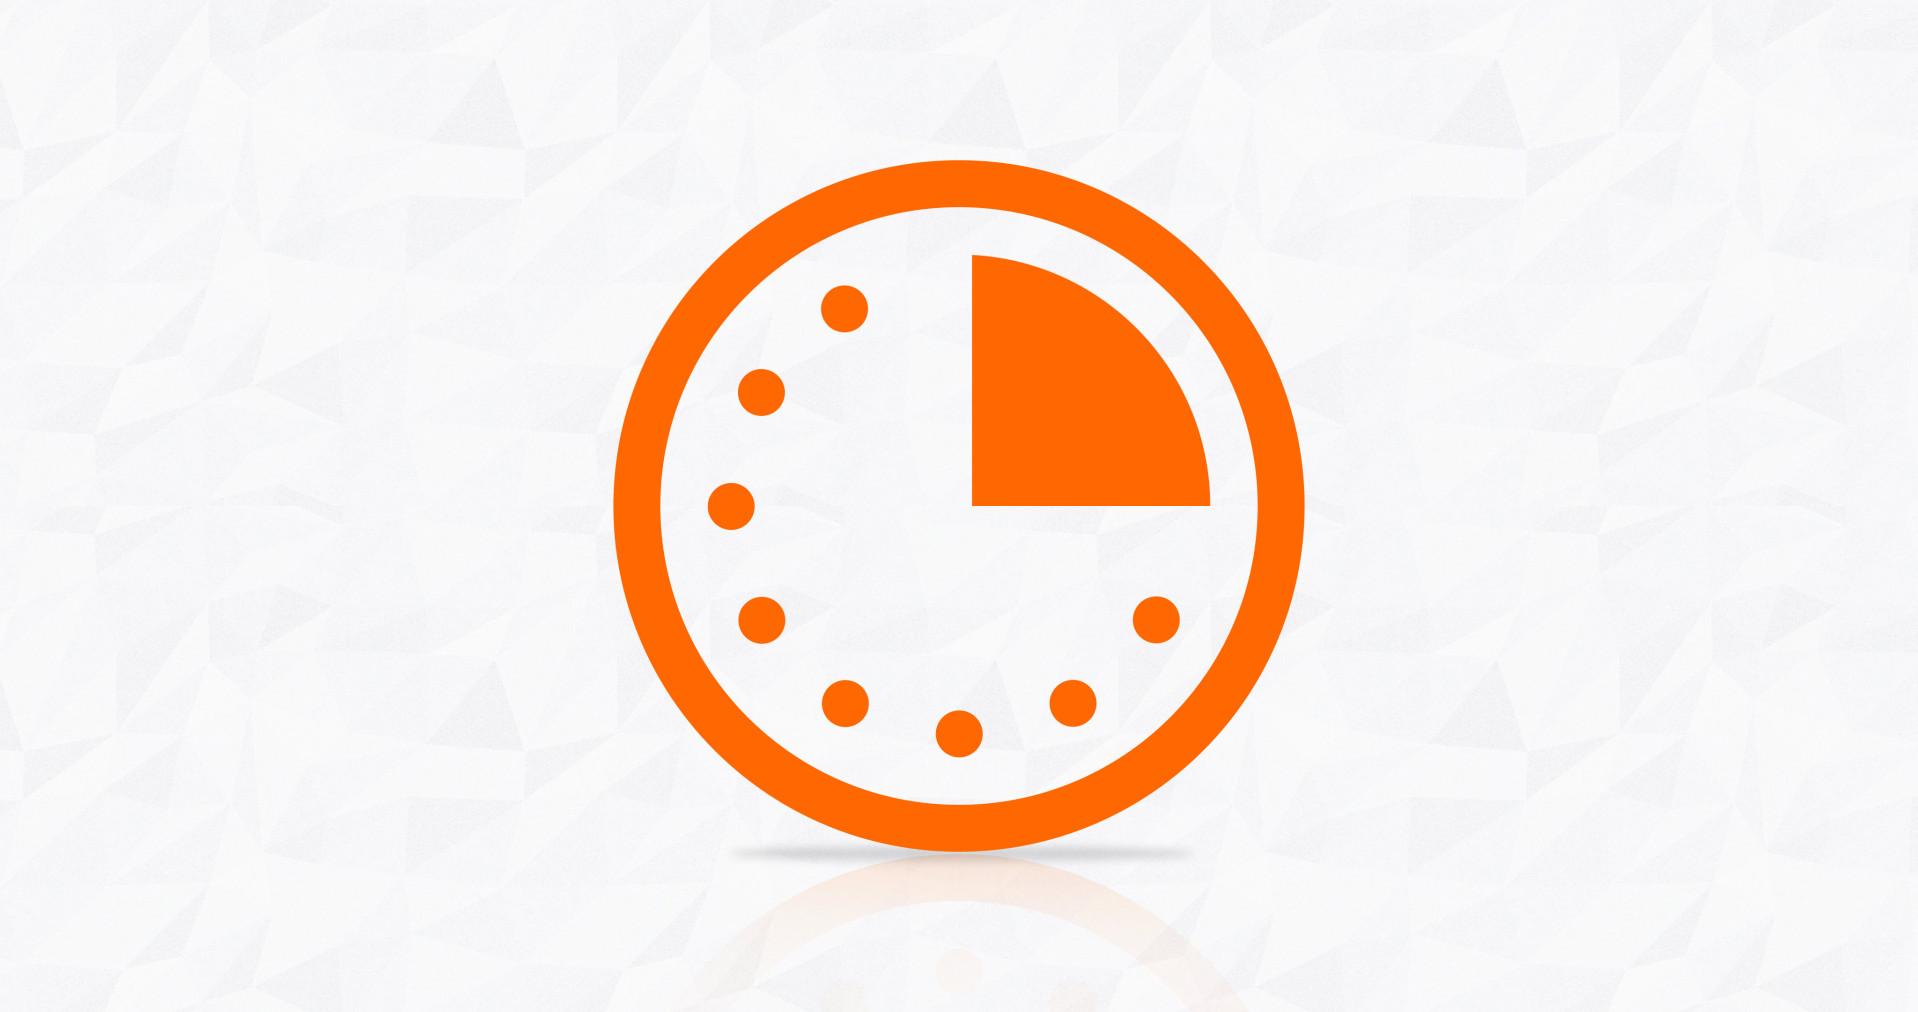 /products/Vehicles/Financing/Running_Time/images/STILL_Grafikproduktion_Finanzierungsloesungen_Laufzeit_4K.jpg